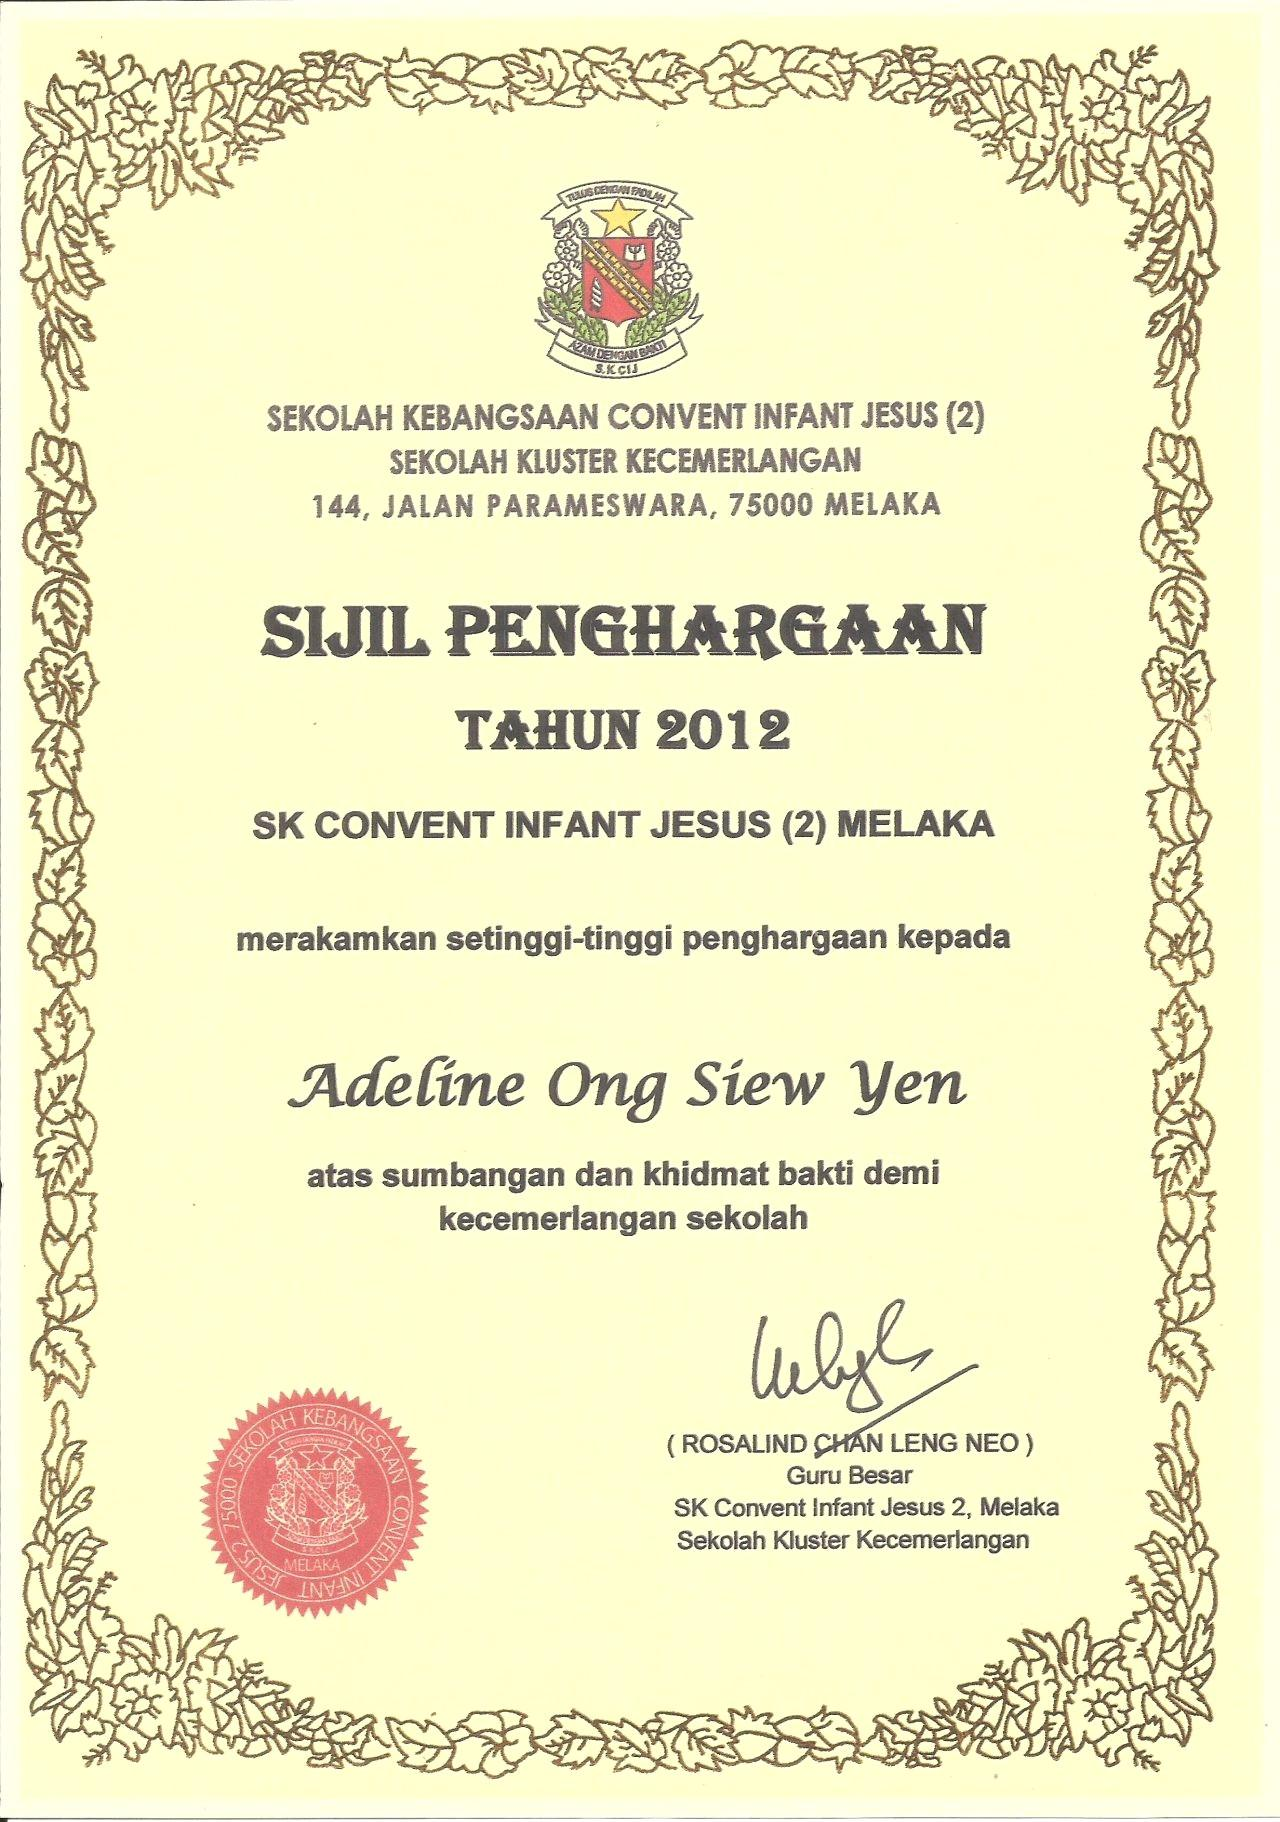 Appreciation Certificate Template In Powerpoint